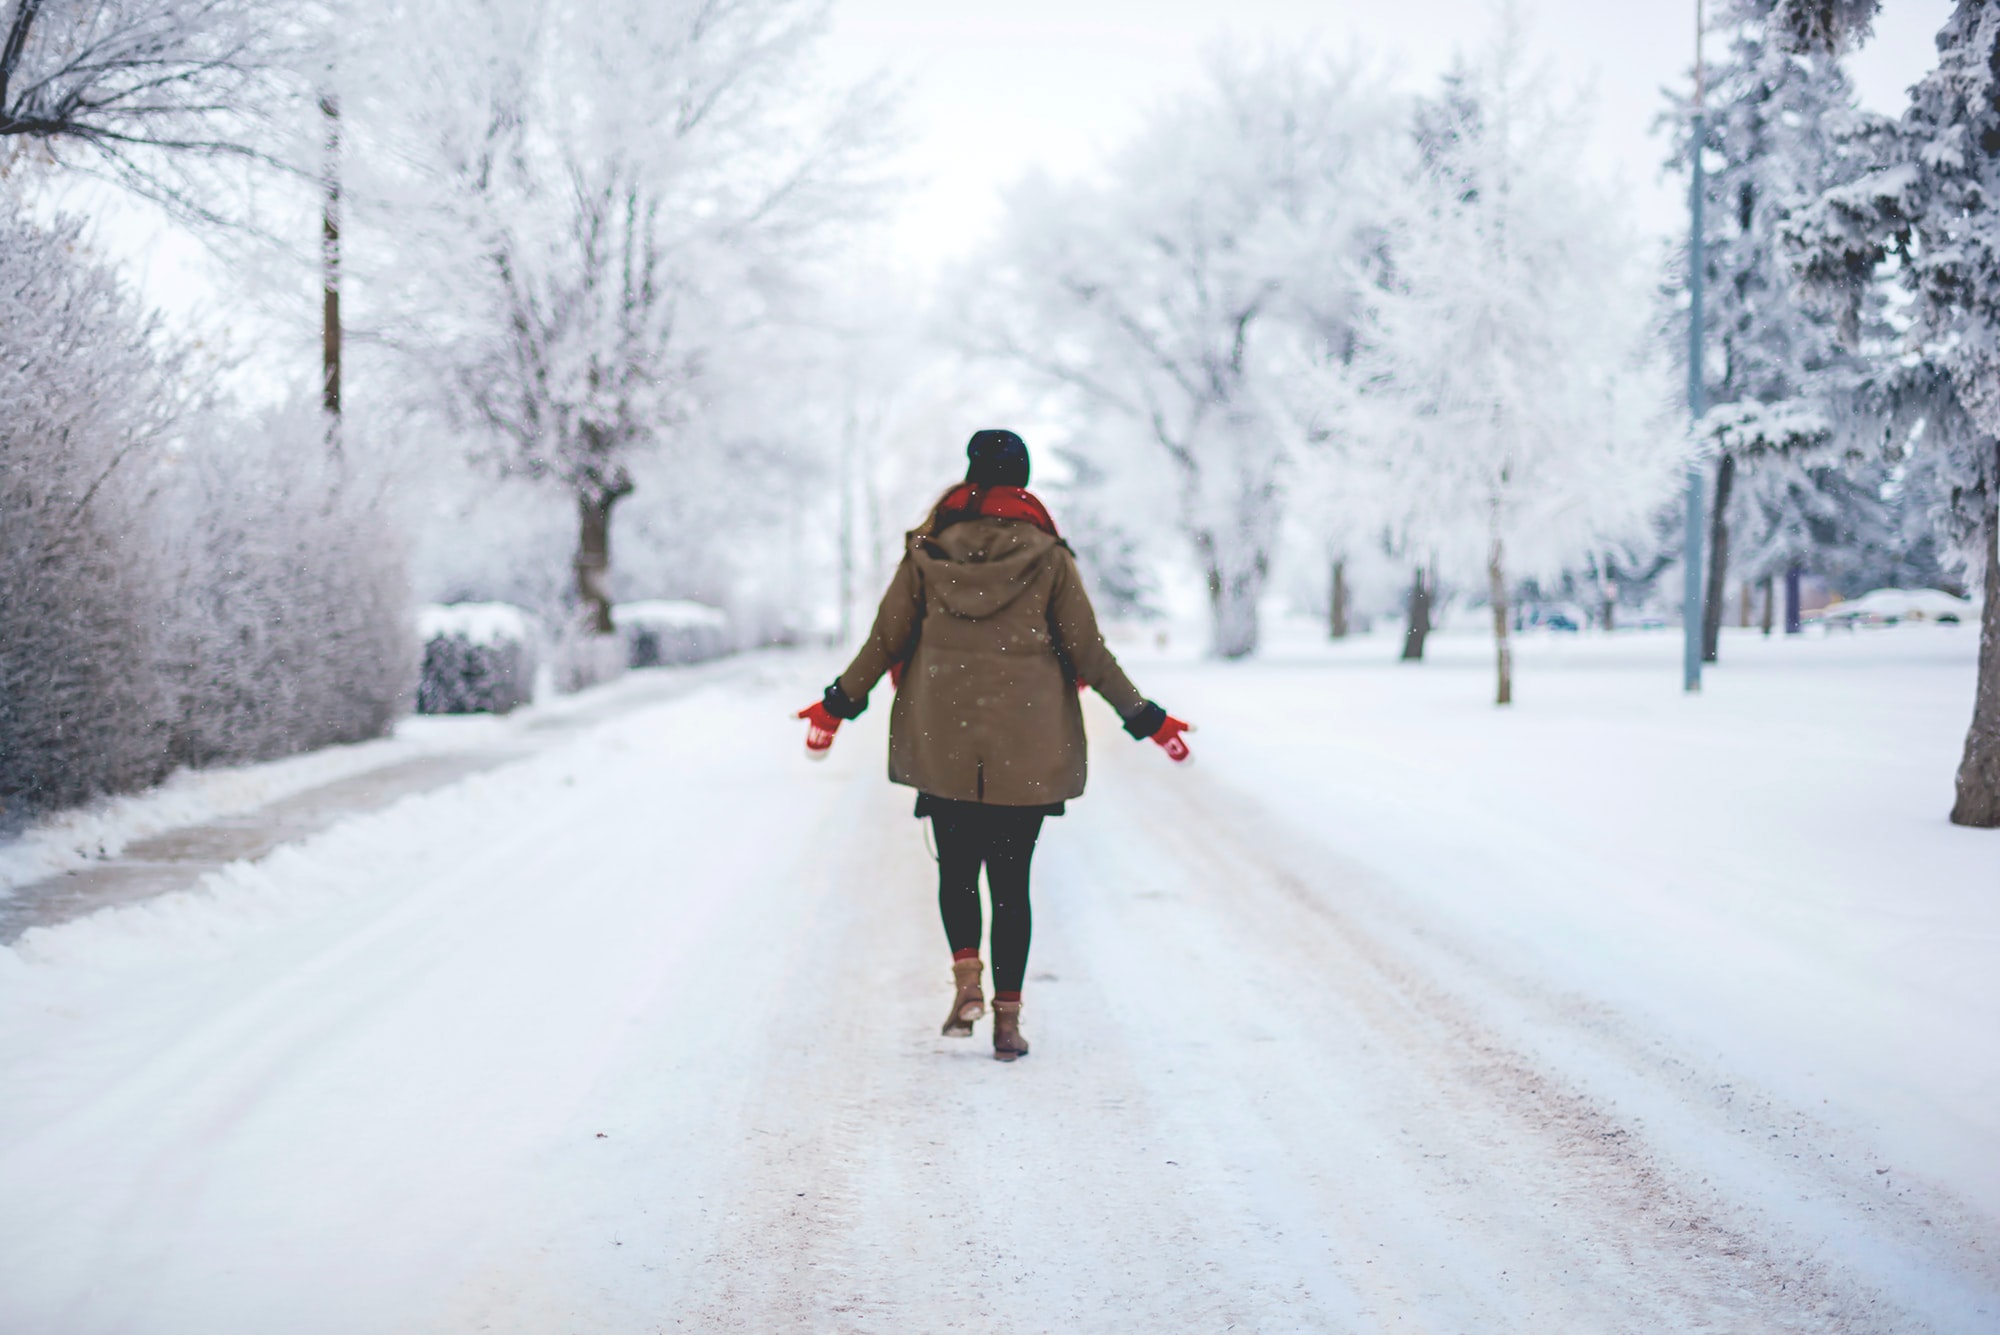 Marvelling in a Winter Wonderland